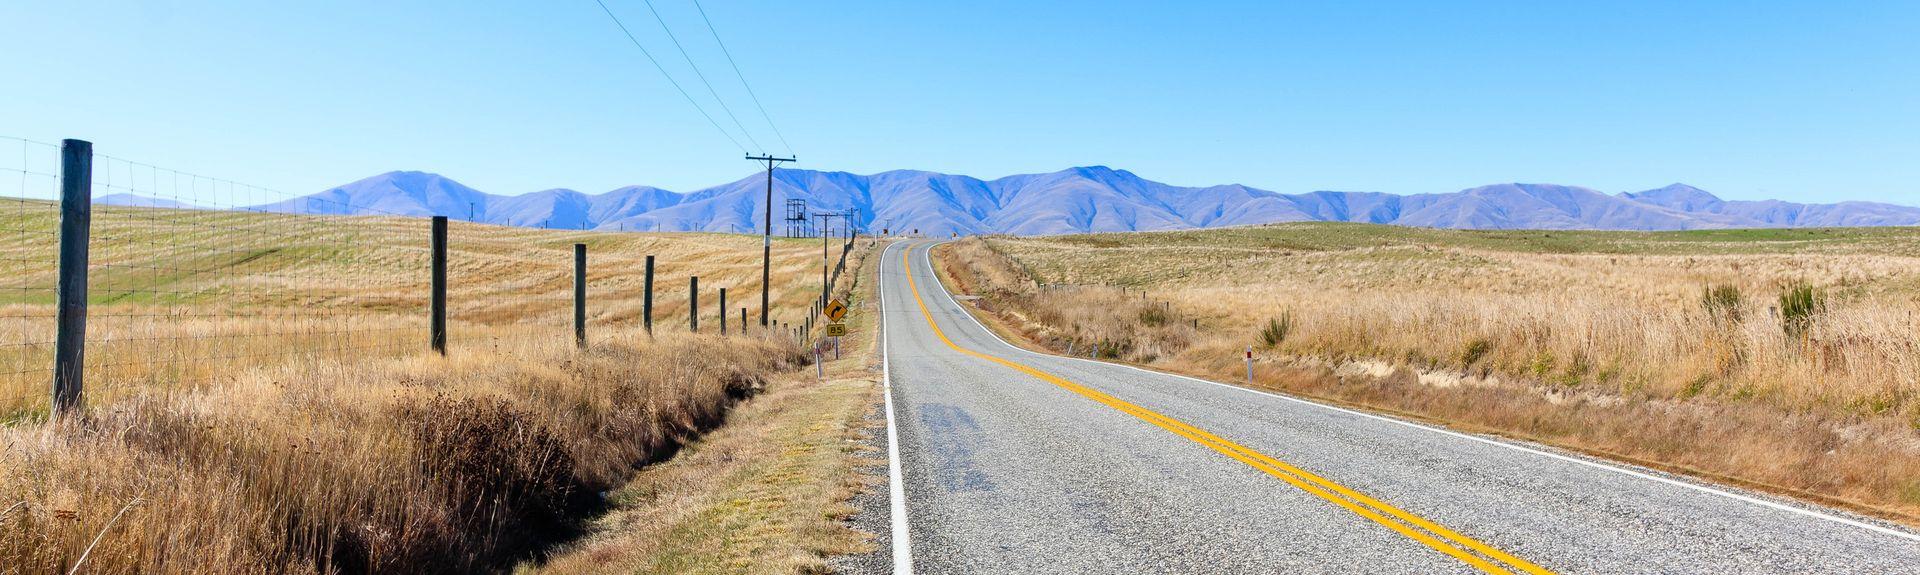 Kakanui, Otago, New Zealand